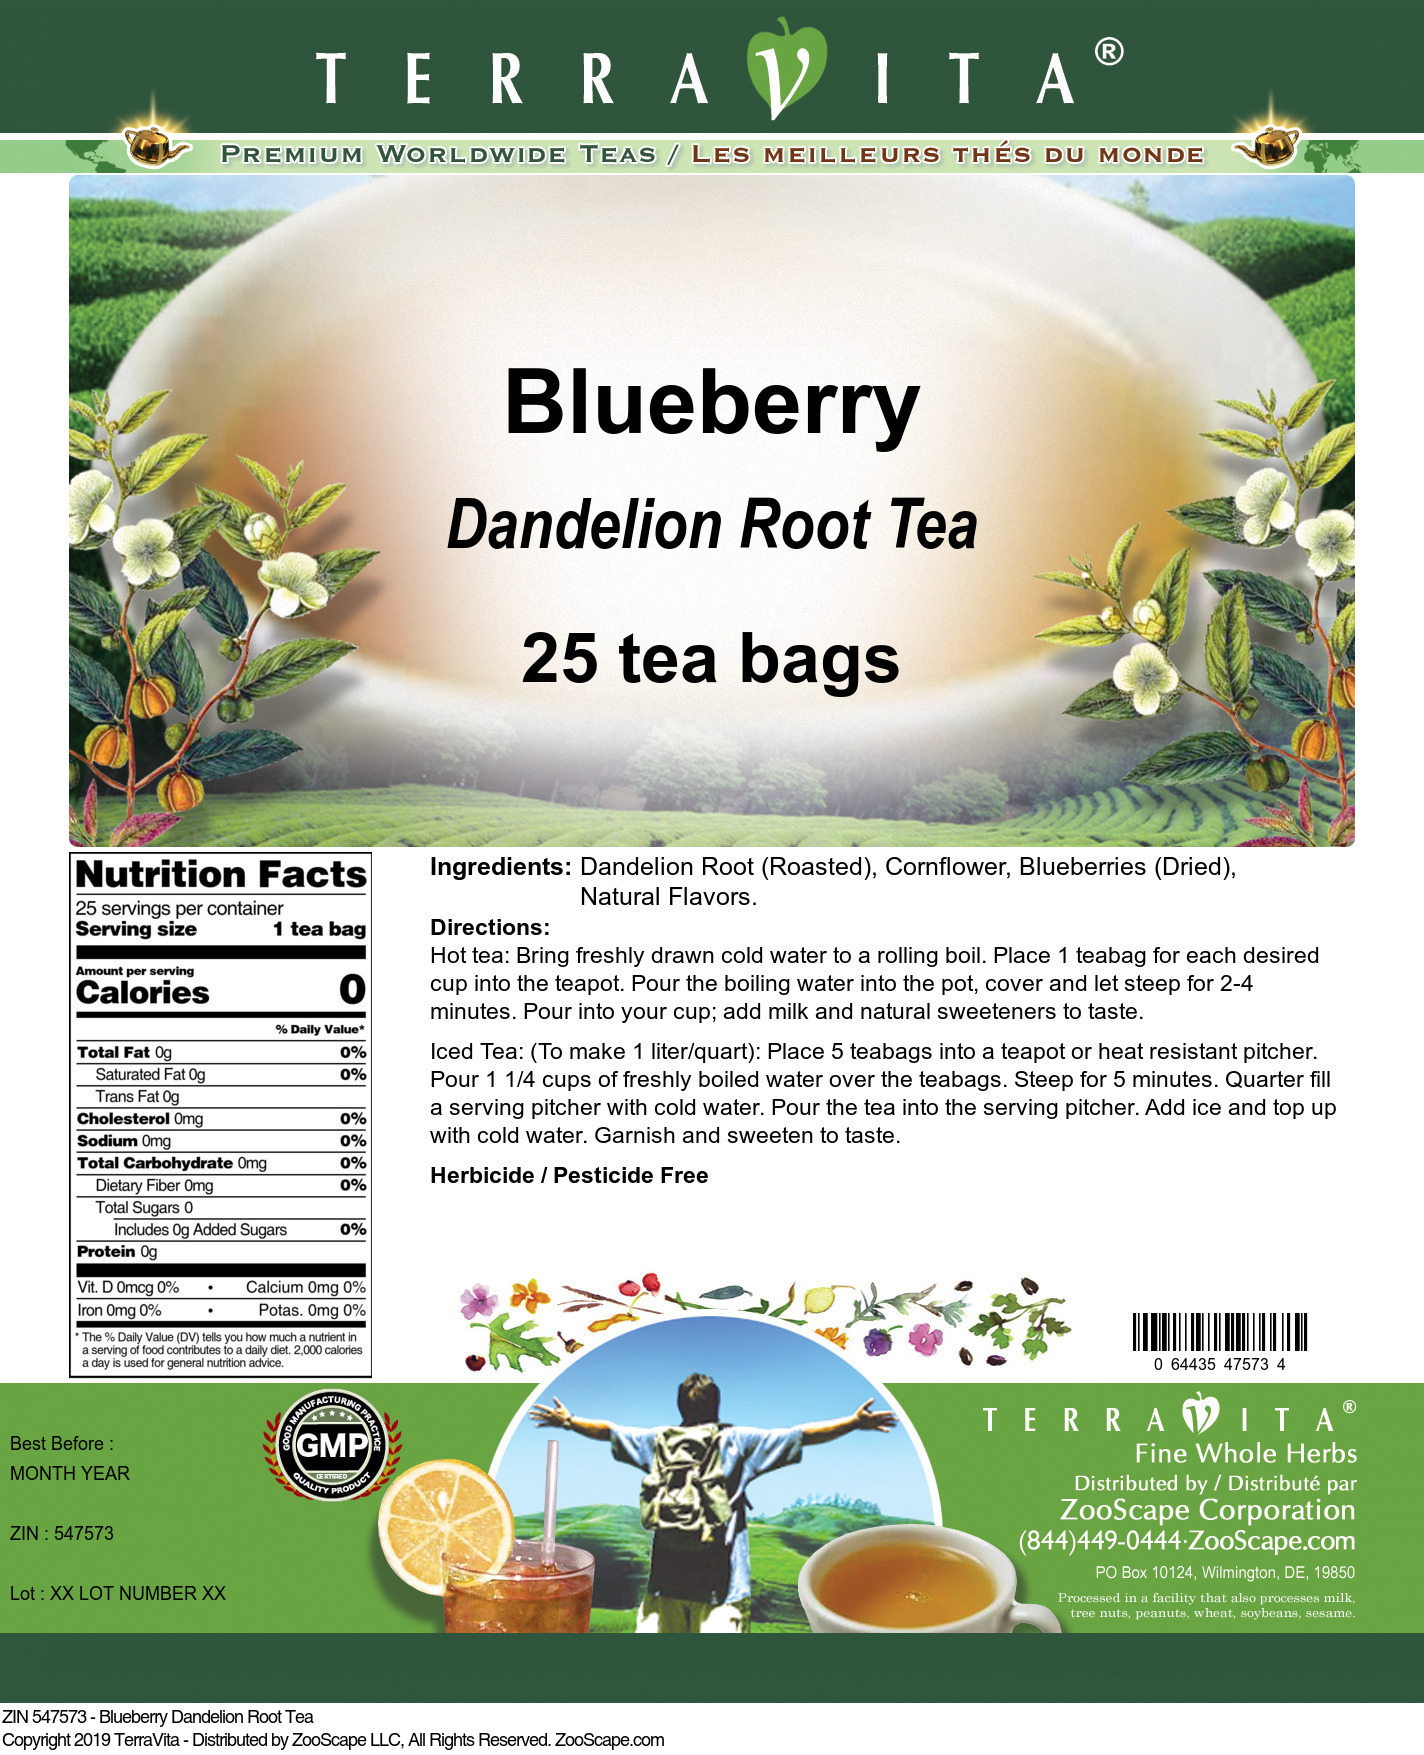 Blueberry Dandelion Root